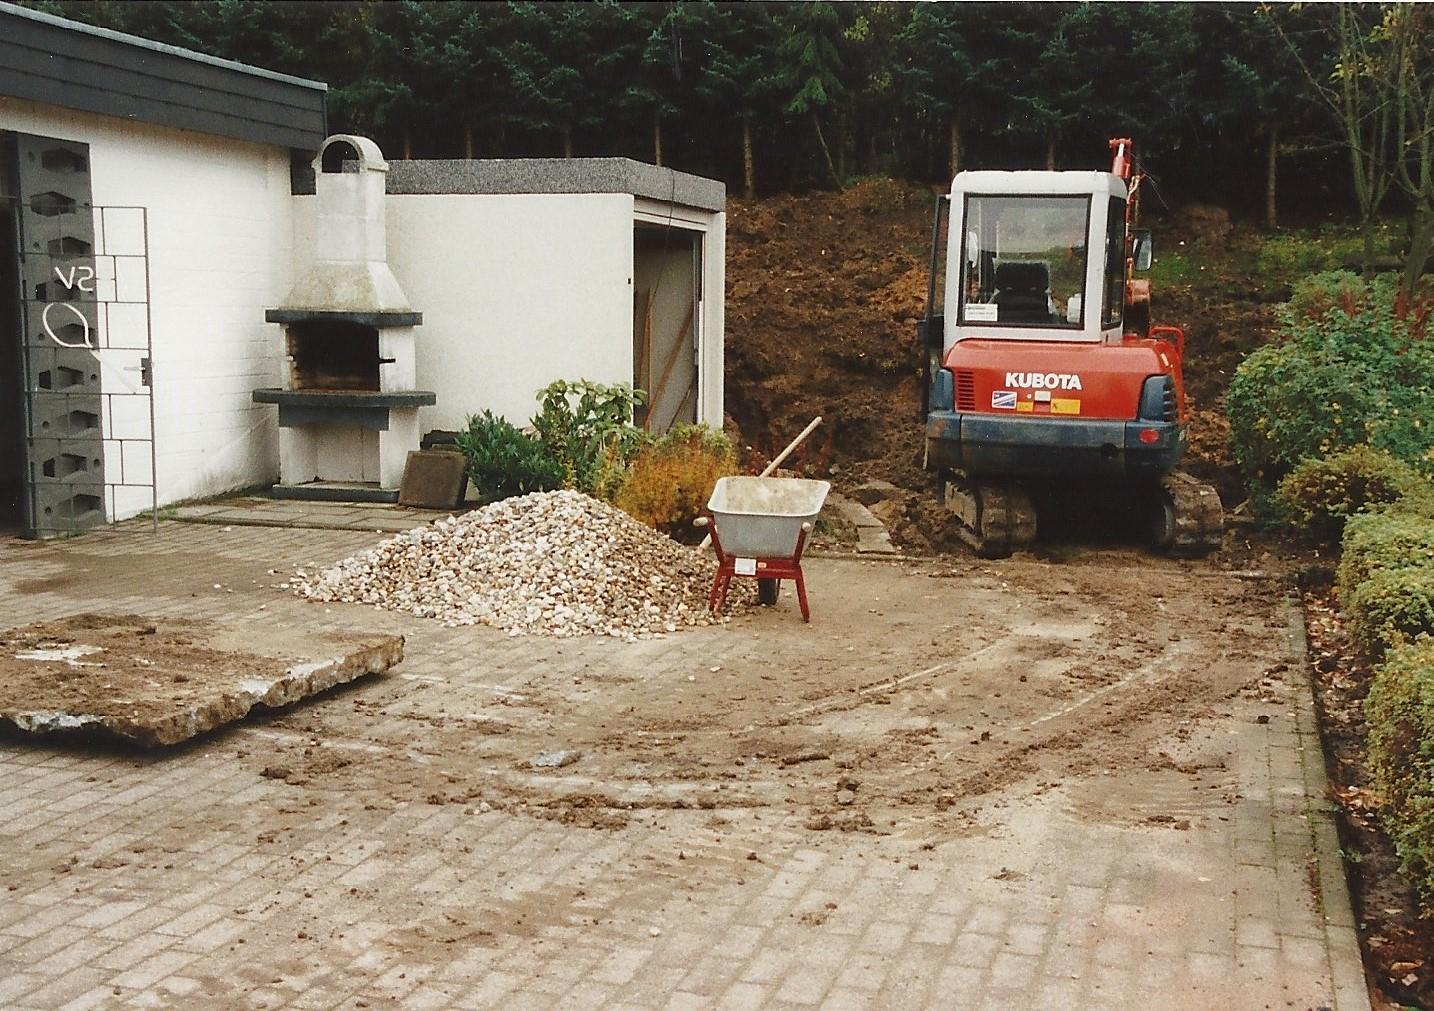 Neubau Terrasse und Boulebahn 1998, 1999